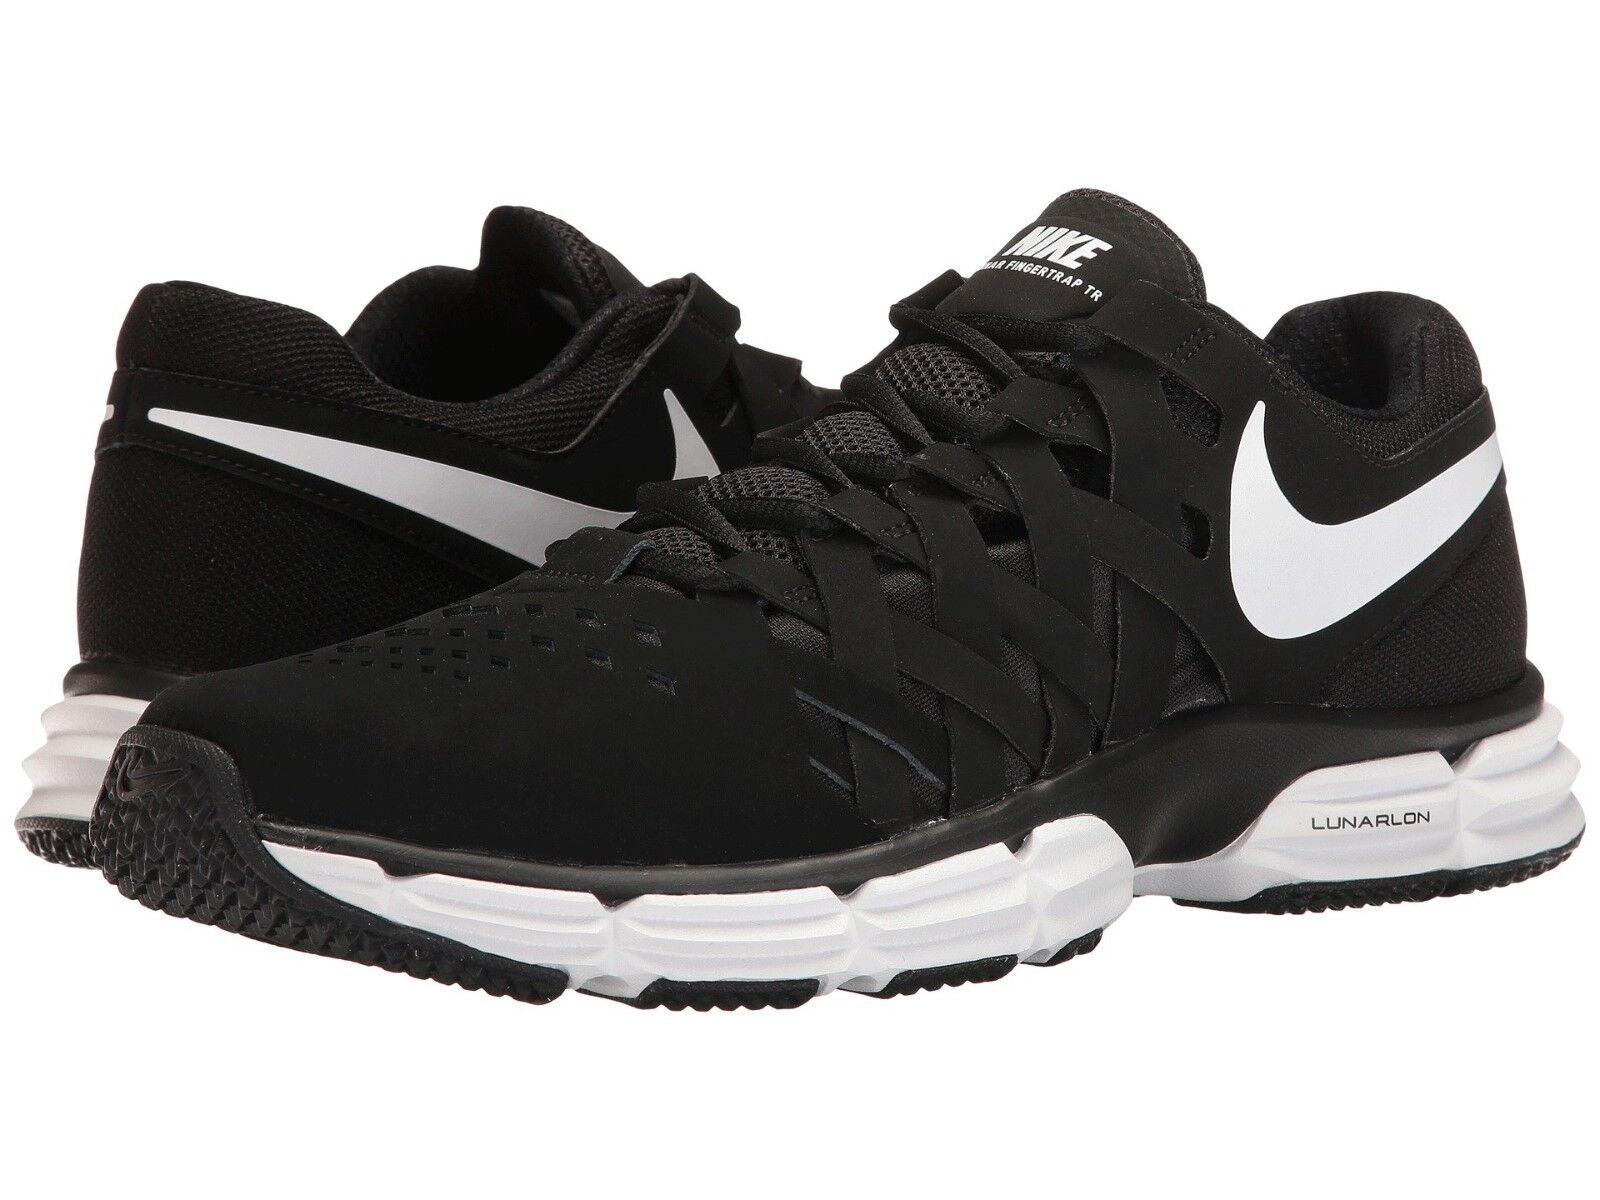 Nike Men Lunar Fingertrap Running shoes Training Sneaker 898066 Black Size14 New